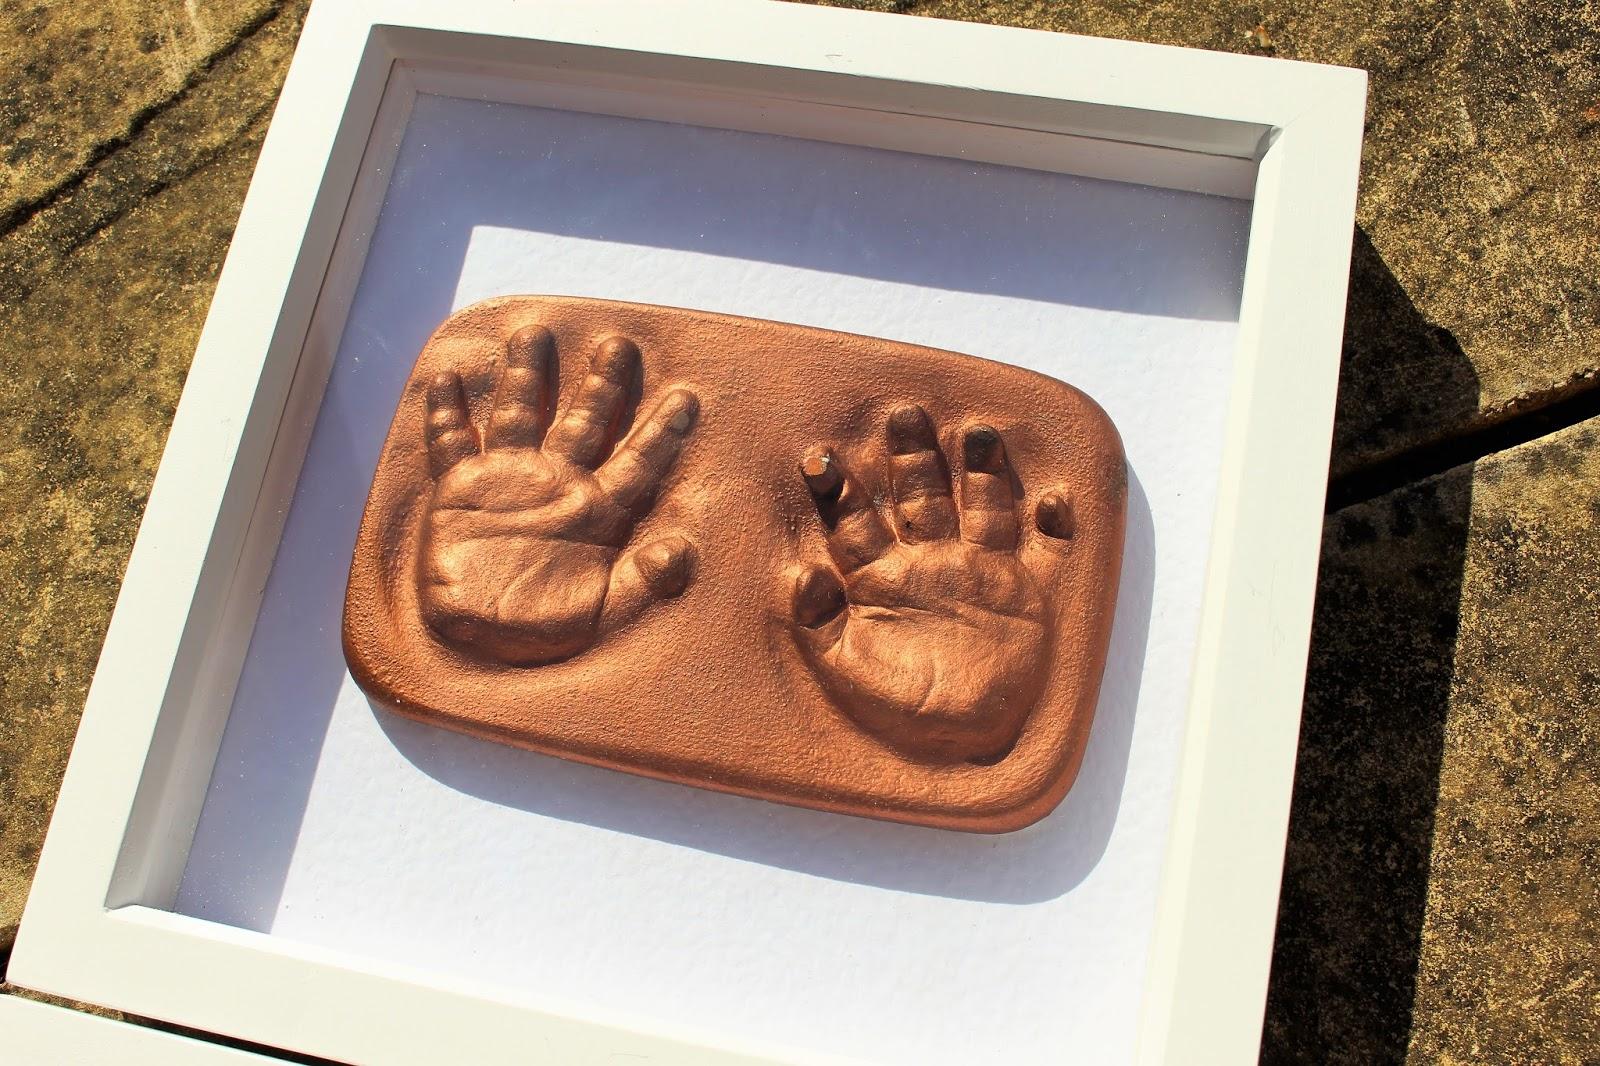 Diy i got phoebes feet hands cast itsjustmehayleyd baby foot and hand castings solutioingenieria Choice Image